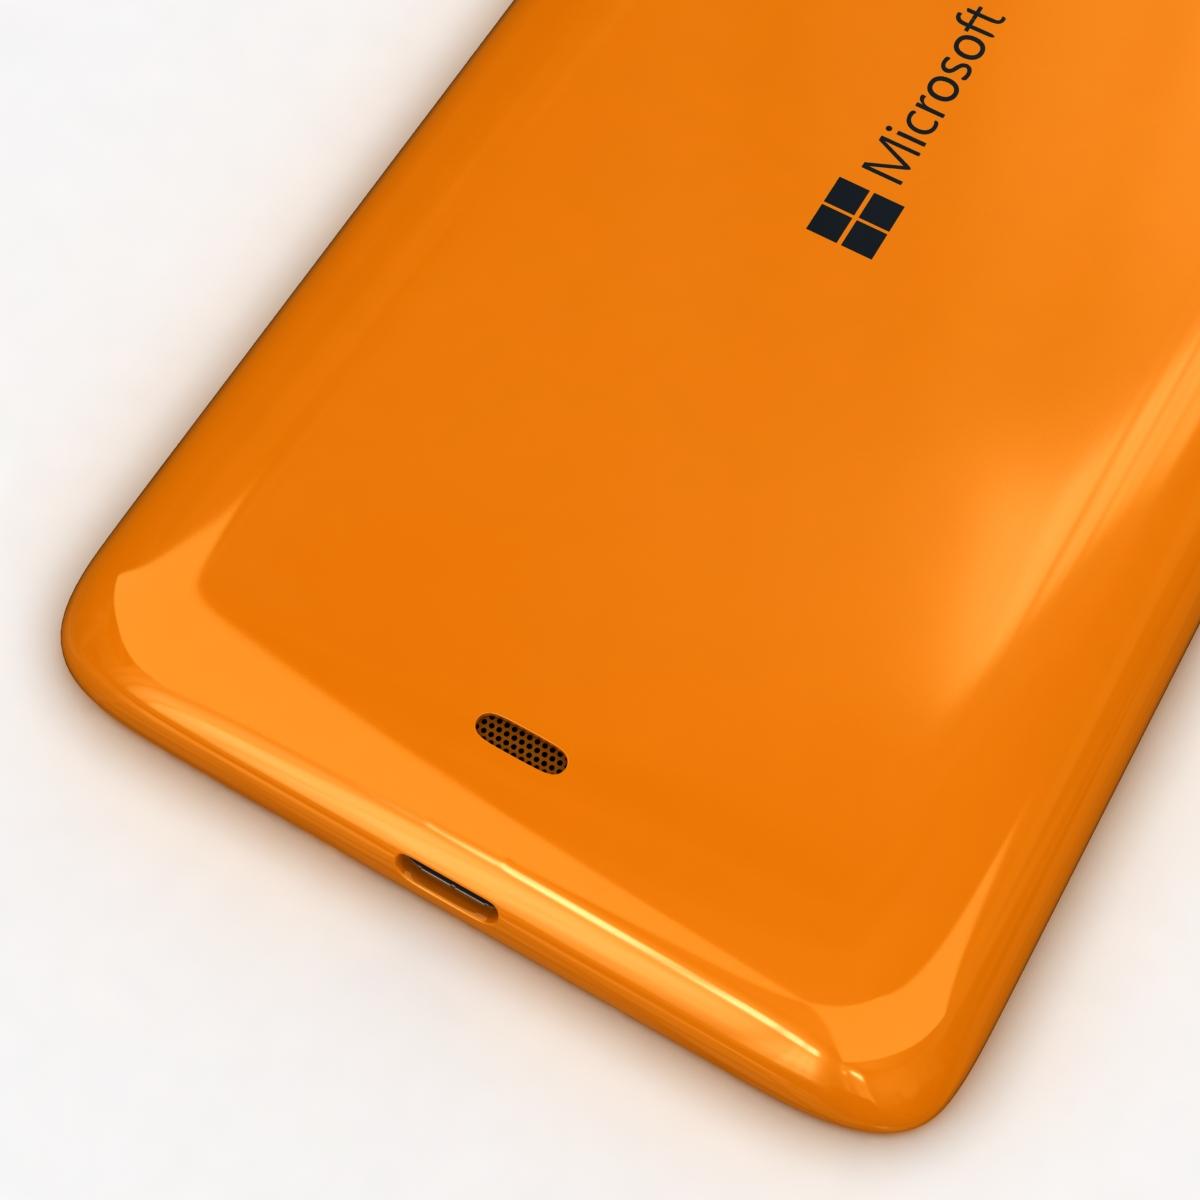 microsoft lumia 535 and dual sim orange 3d model 3ds max fbx c4d obj 204114